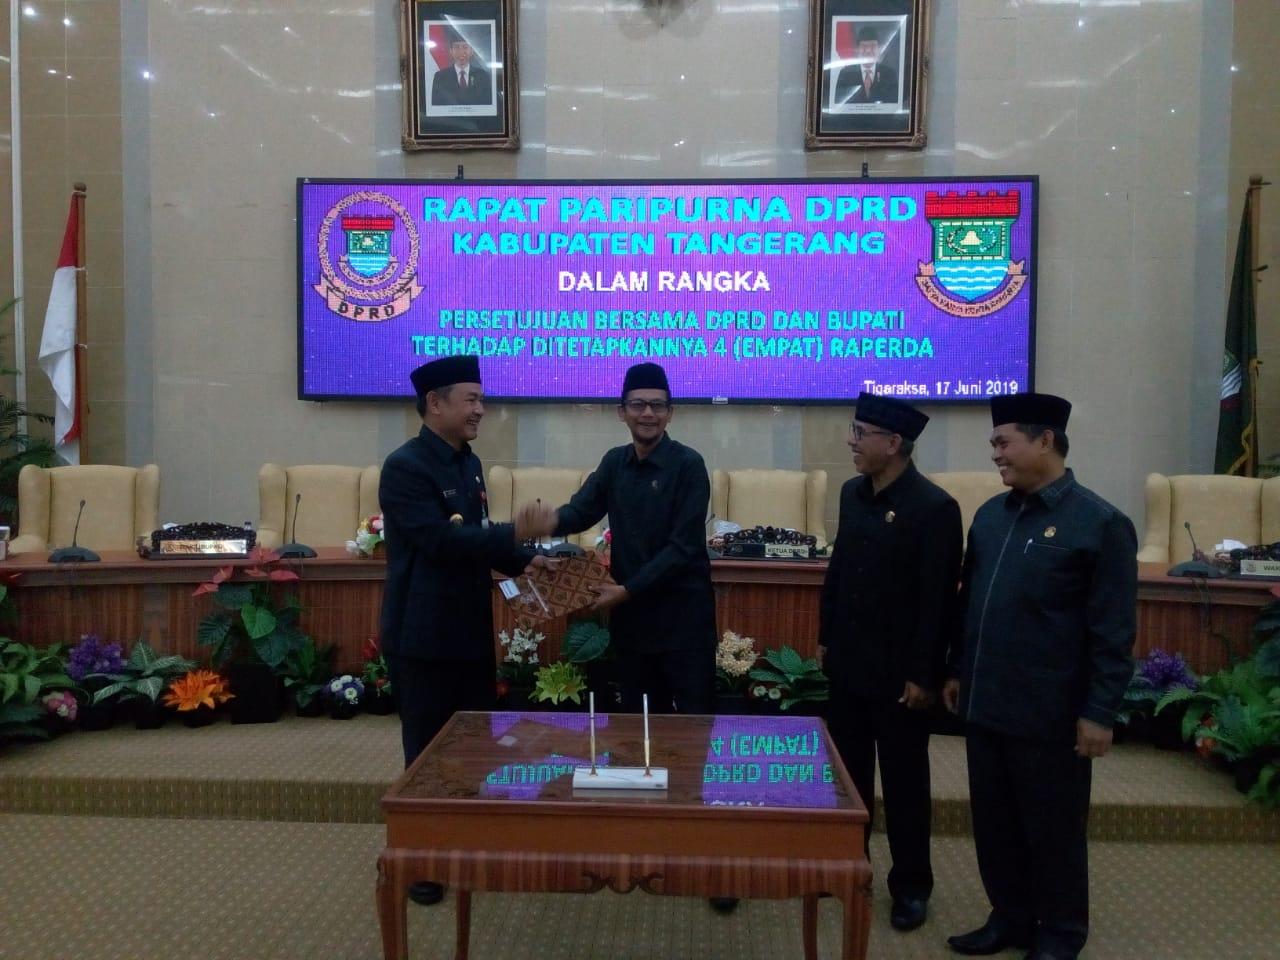 DPRD Kabupaten Tangerang mengesahkan empat Raperda menjadi Perda, Senin (17/6/2019). Perda ini diharapkan segera tersosialisasikan kepada masyarakat.